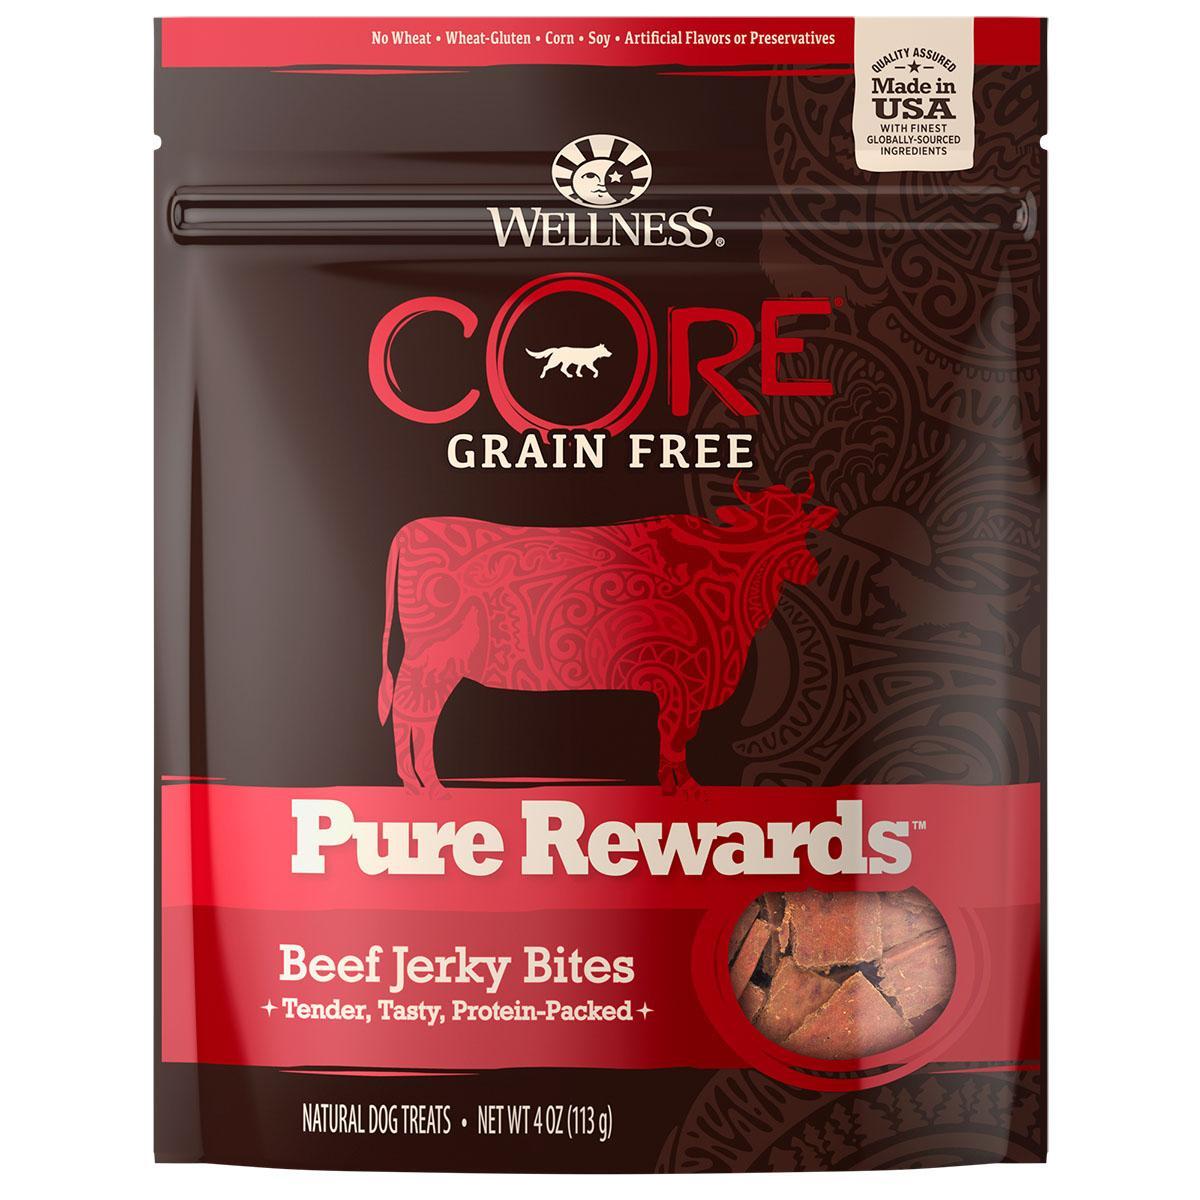 Wellness CORE Natural Grain Free Pure Rewards Jerky Bites - Beef